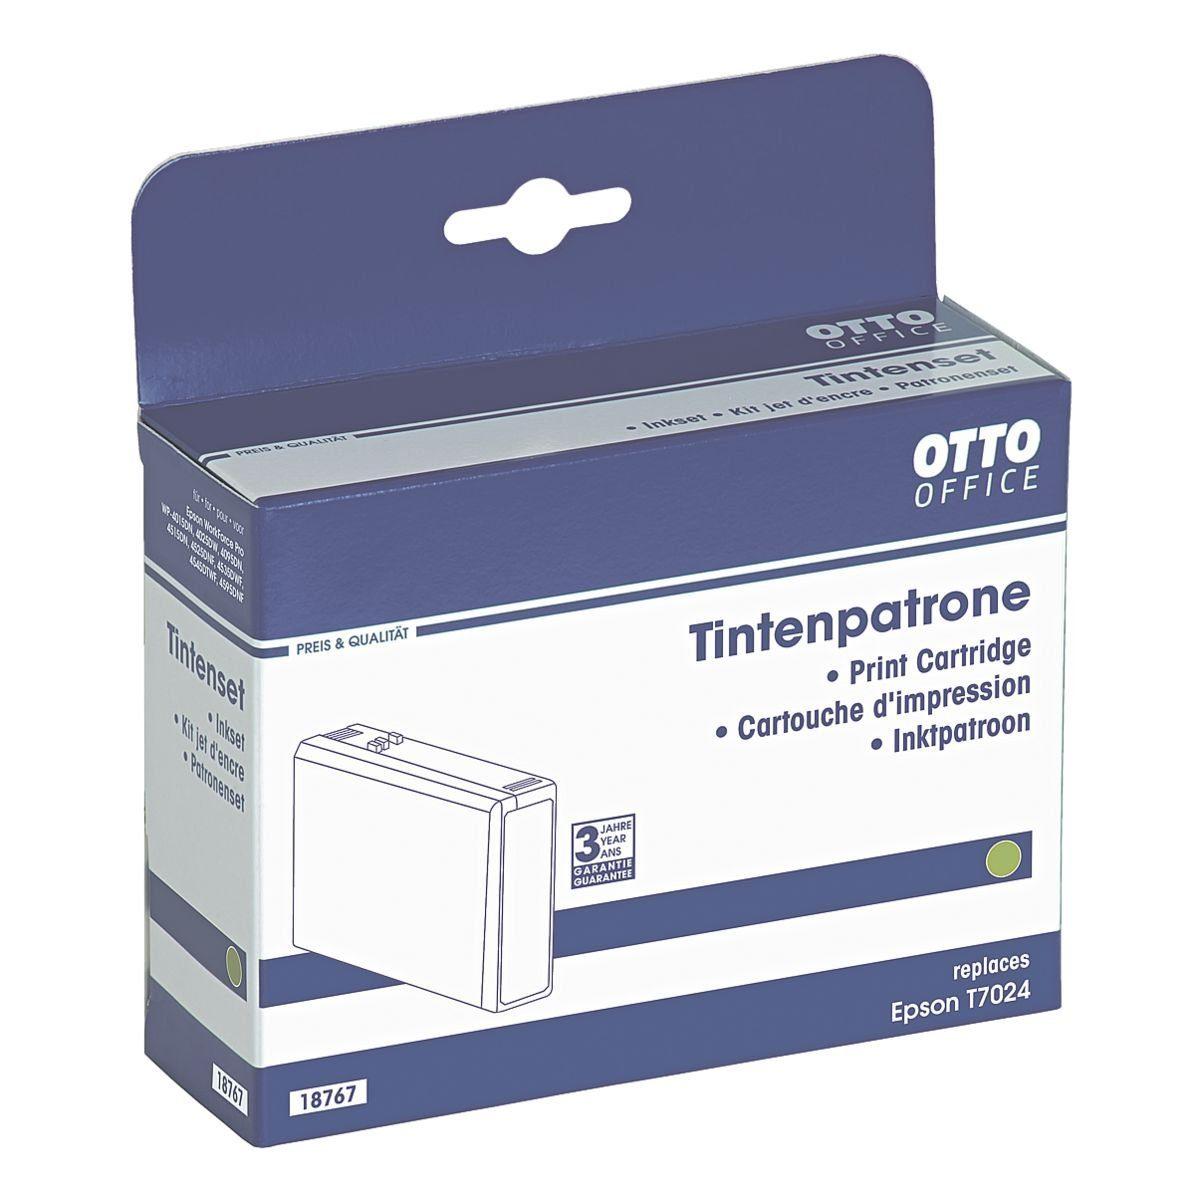 OTTO Office Standard Tintenpatrone ersetzt Epson »T0724«